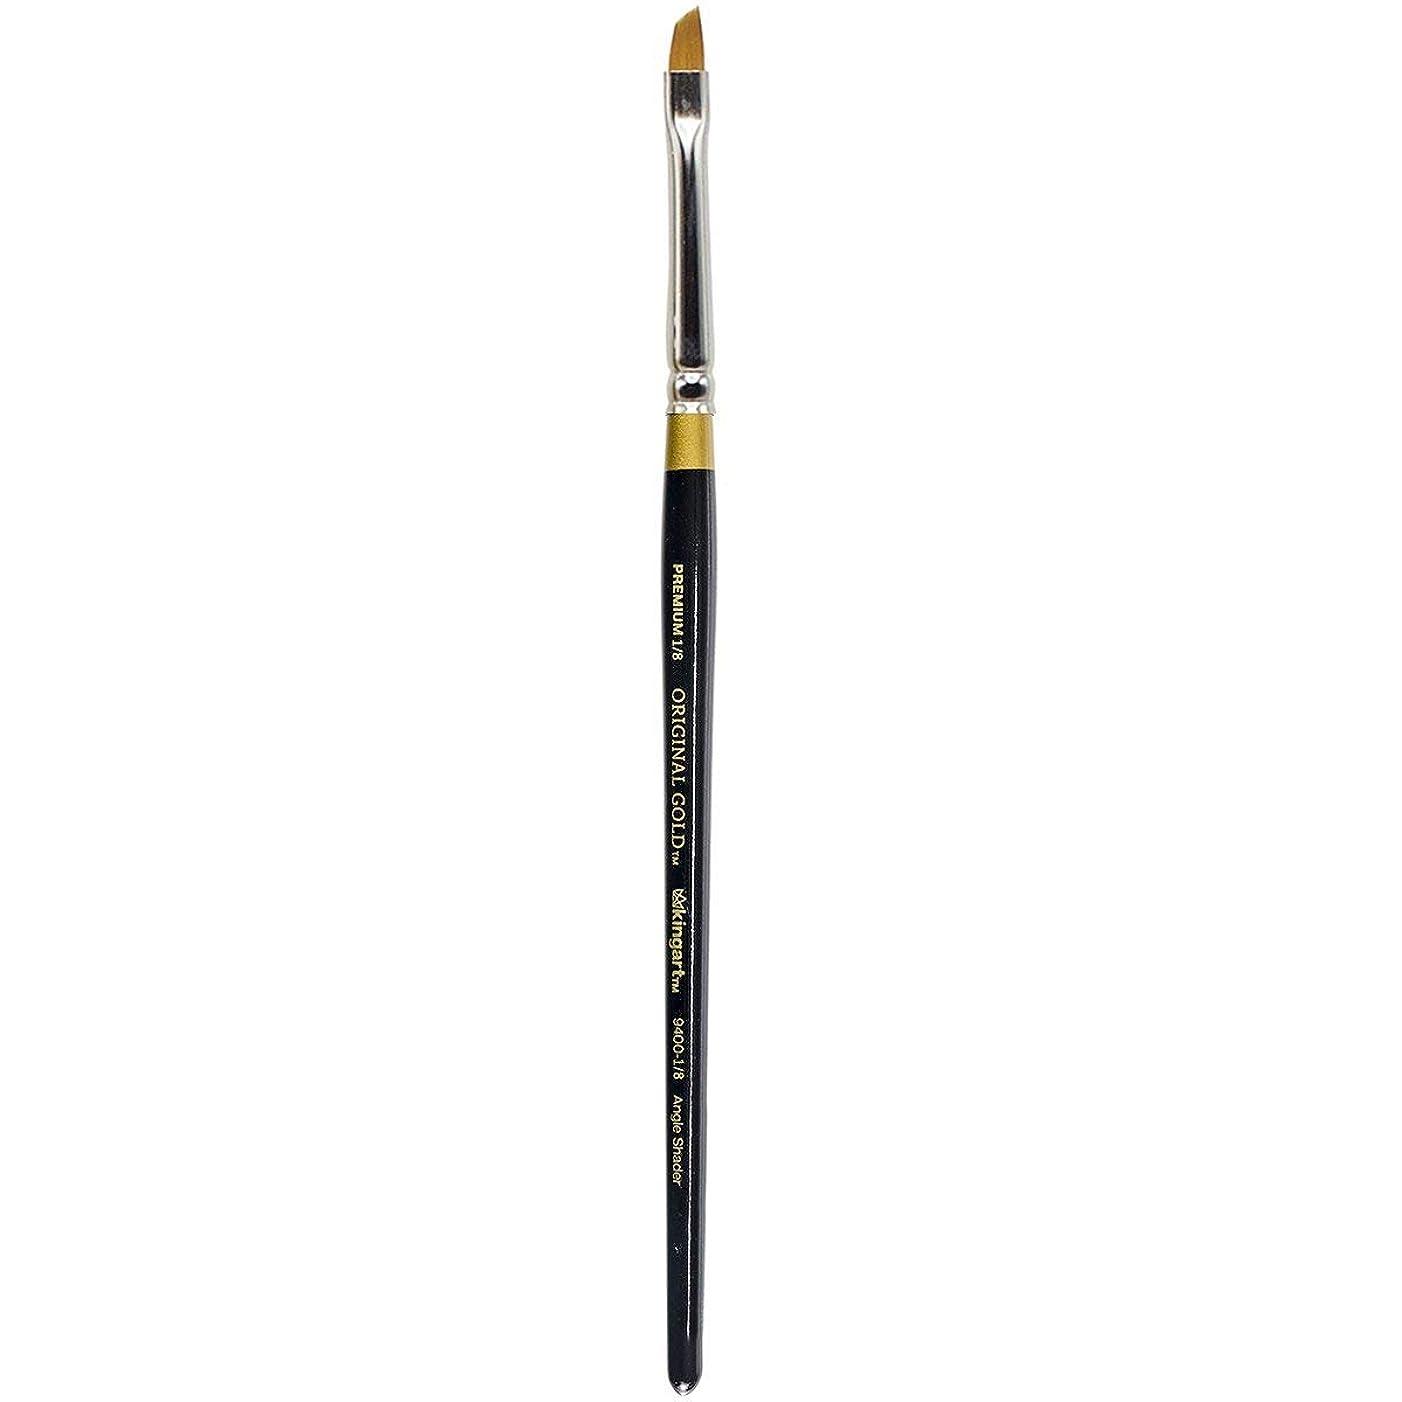 KINGART Original Gold 9400-1/8, Premium Artist Brush, Golden TAKLON Angular Shader-Size: 1/8, Black